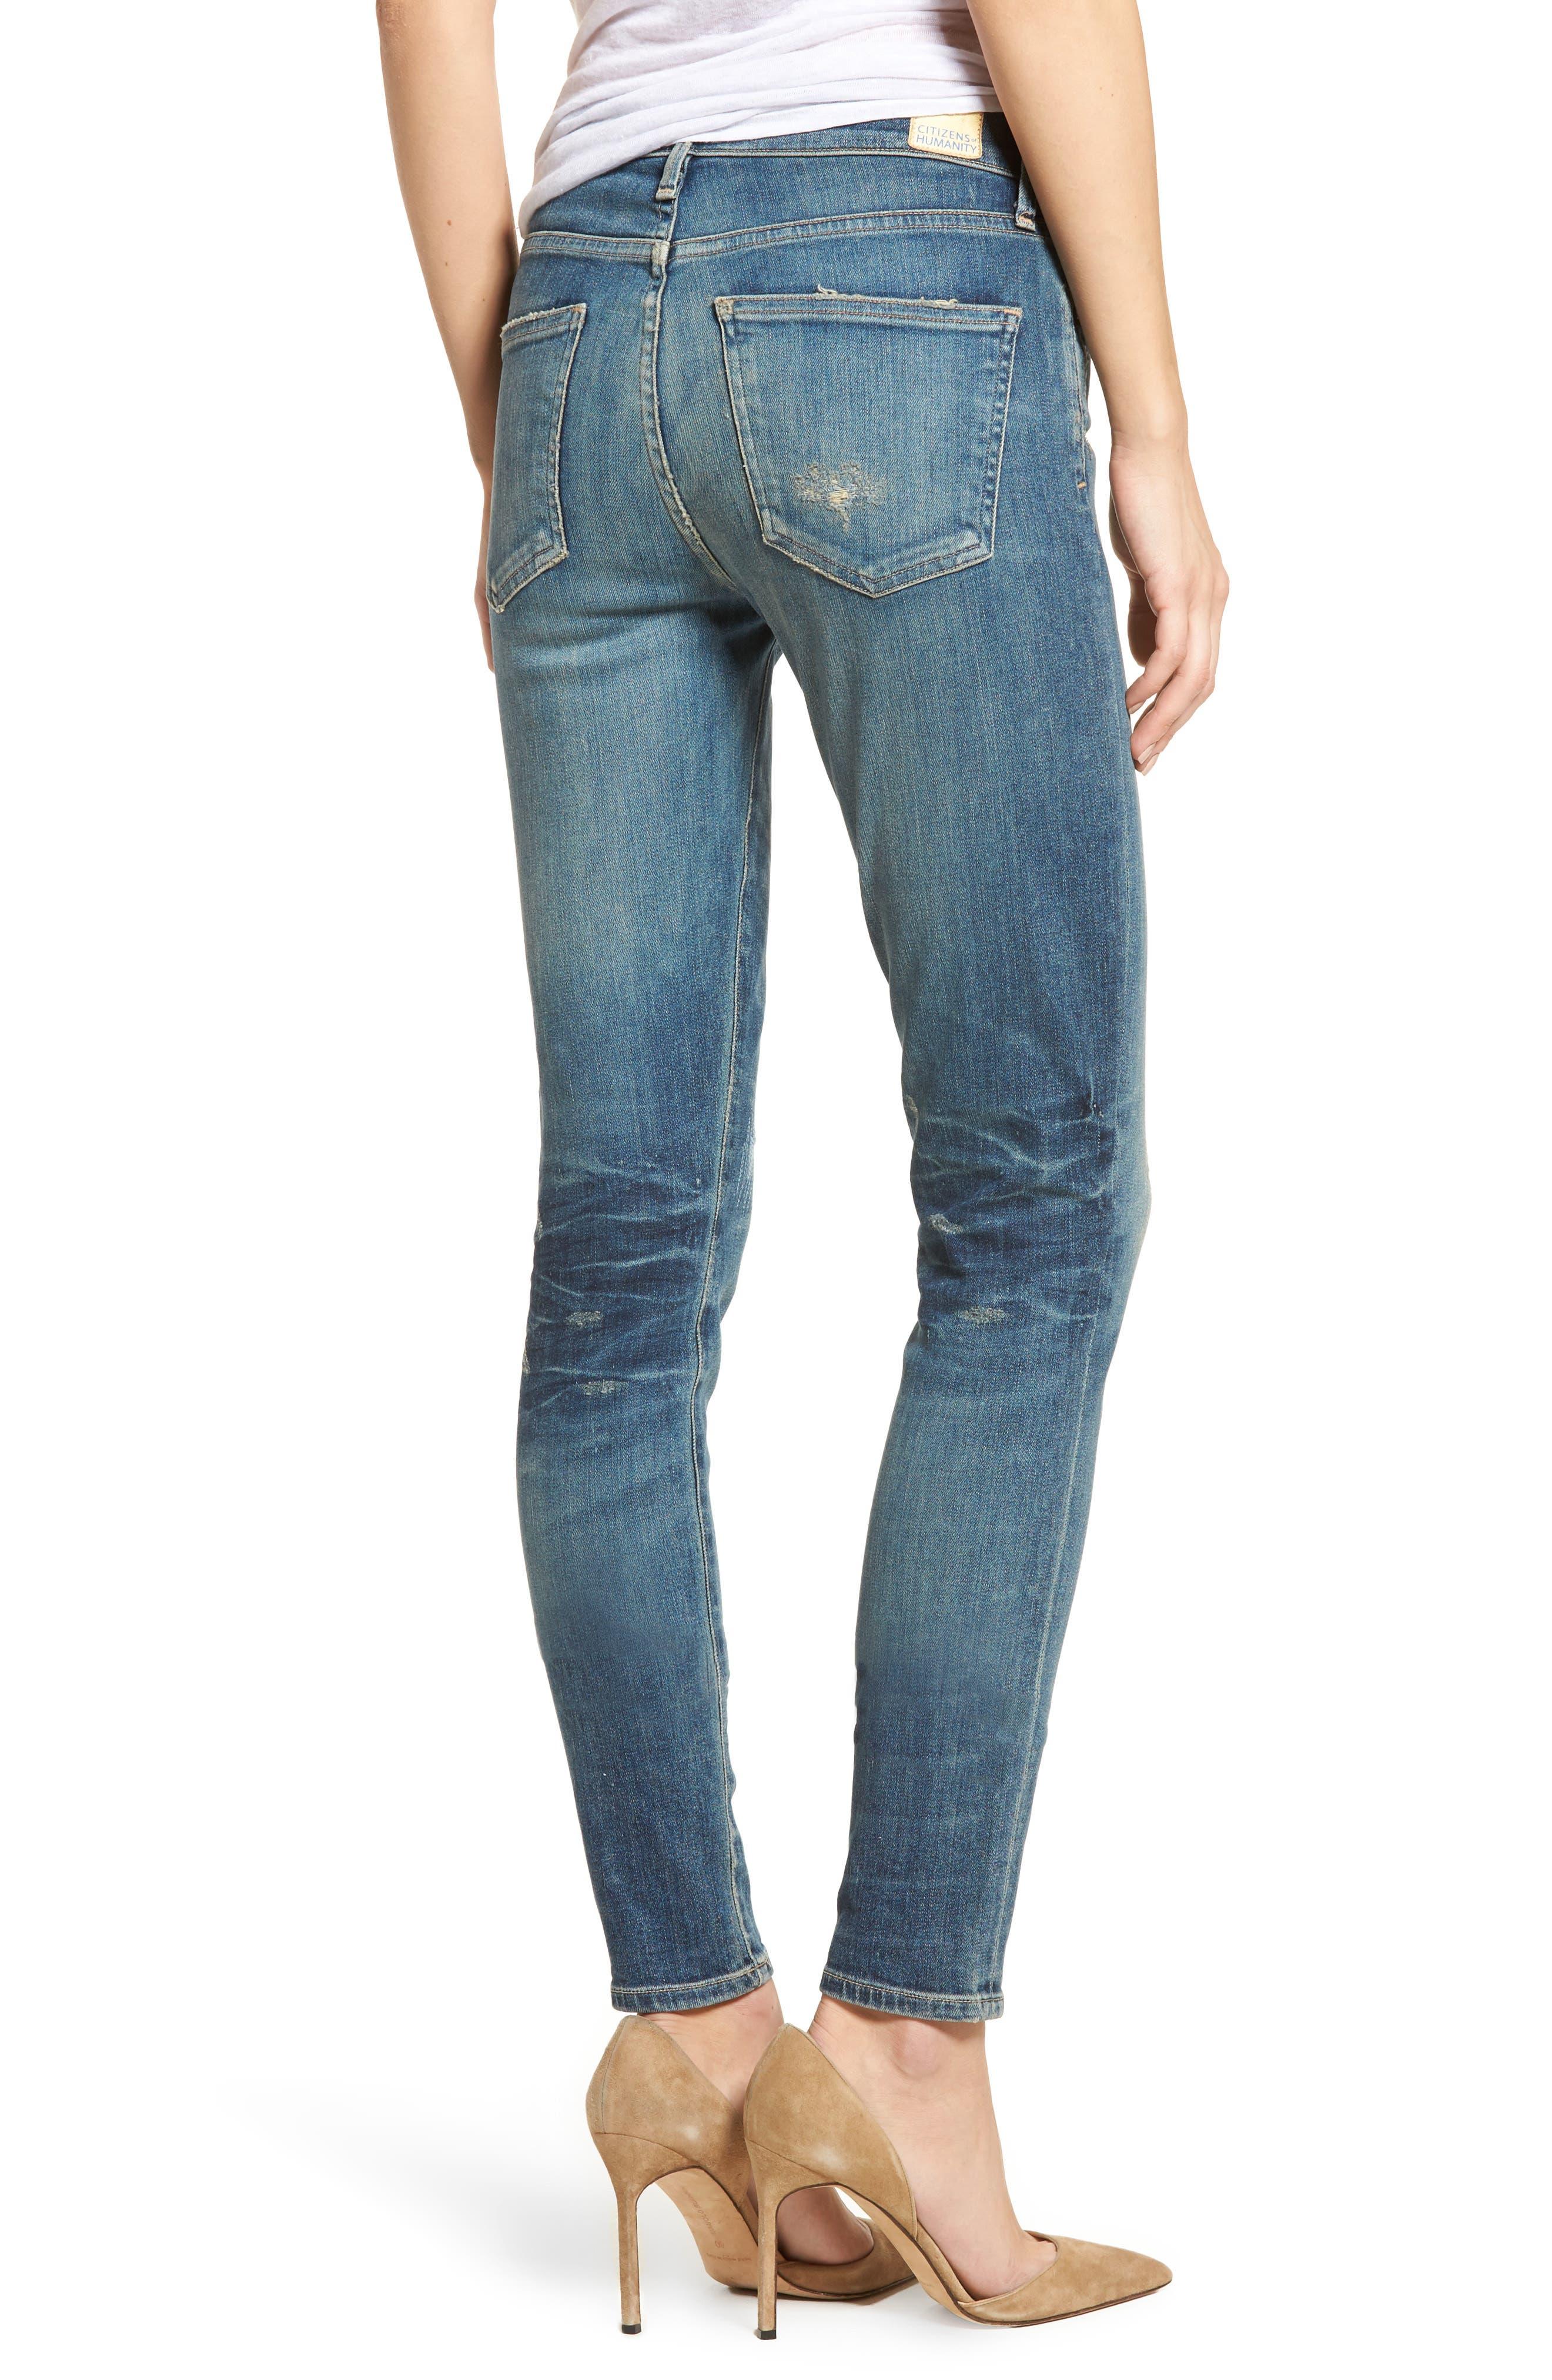 Rocket High Waist Skinny Jeans,                             Alternate thumbnail 2, color,                             465